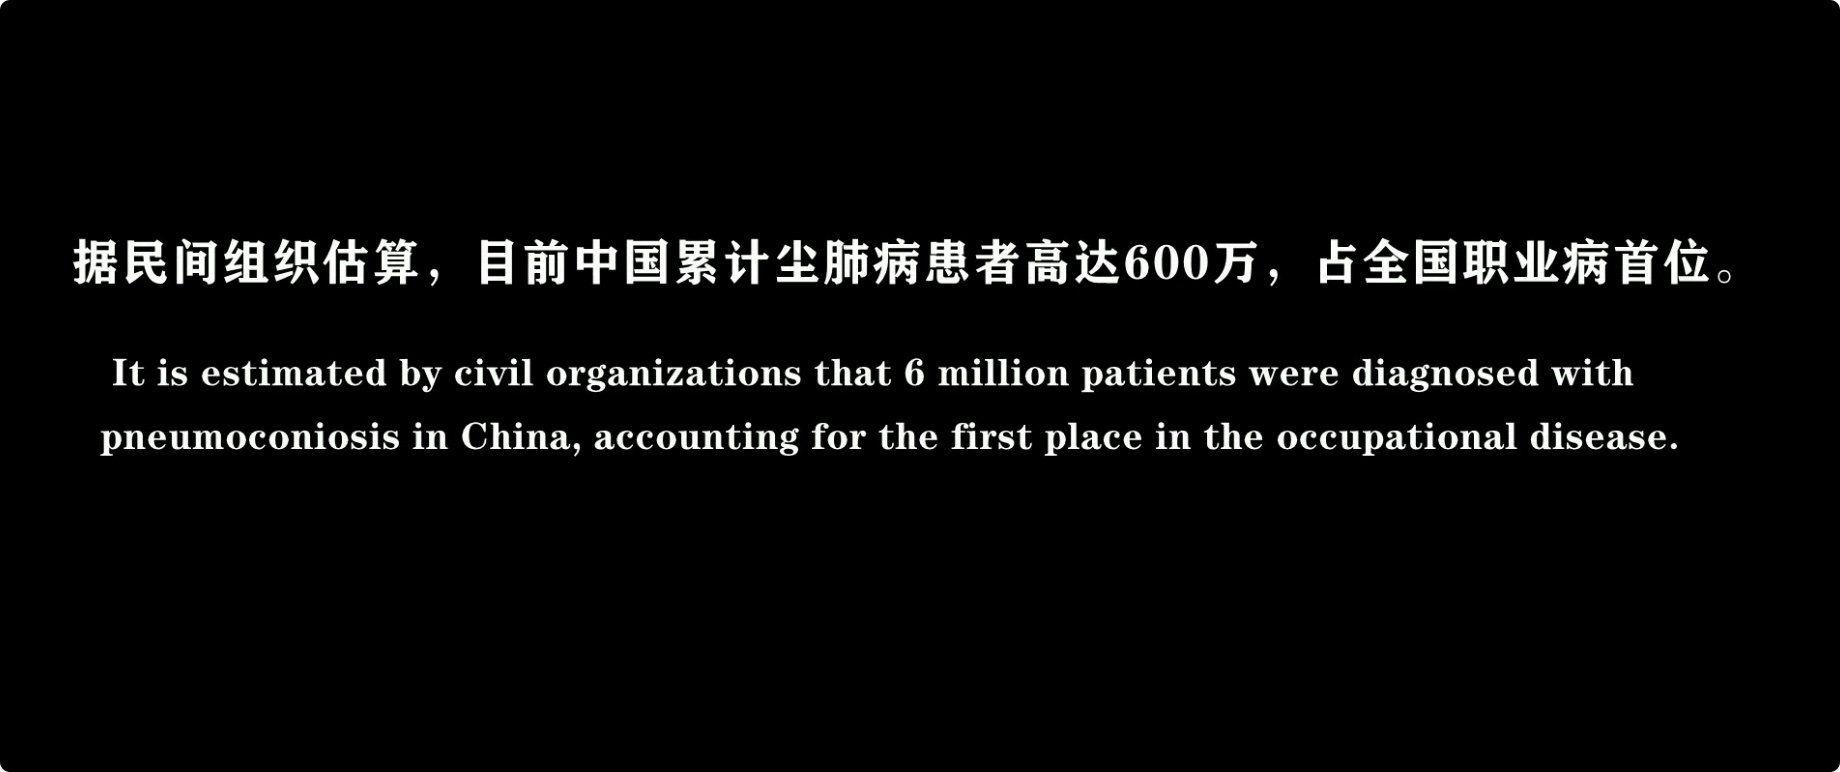 5e9089d85e979 - 中国社会纪录片《矿民、马夫、尘肺病》